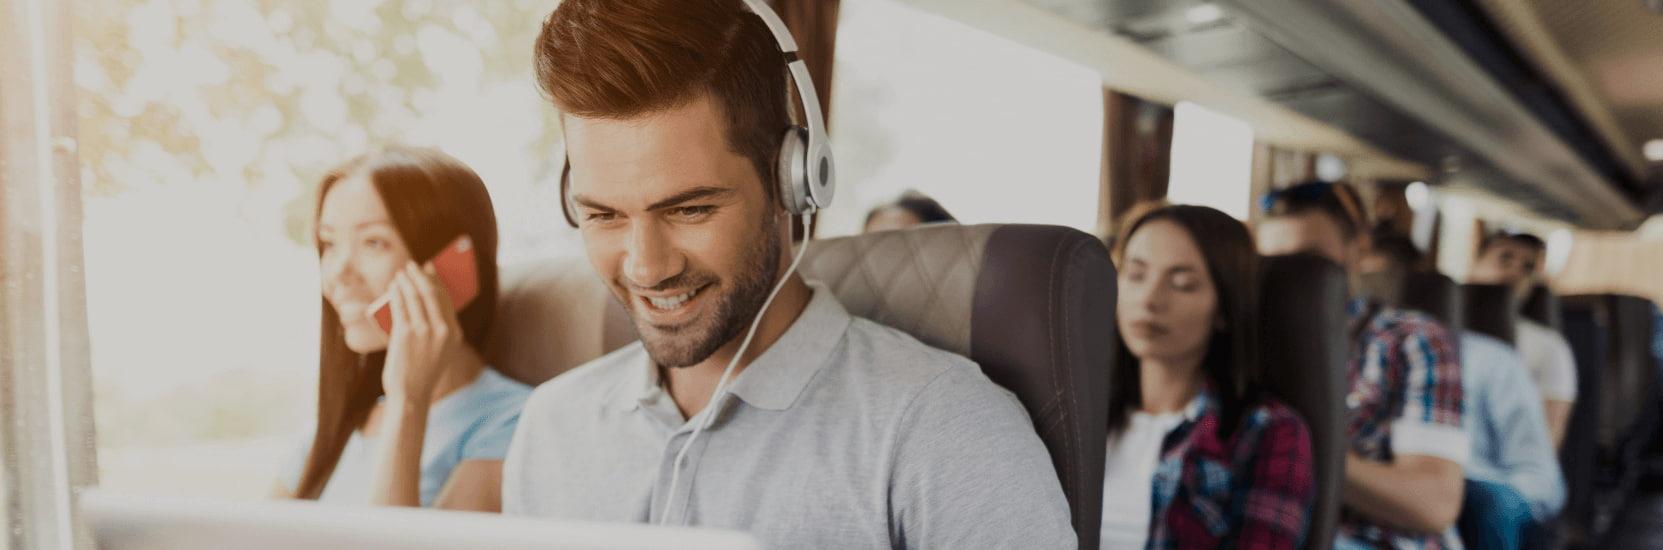 Employee Shuttle Bus & Minibus Rental